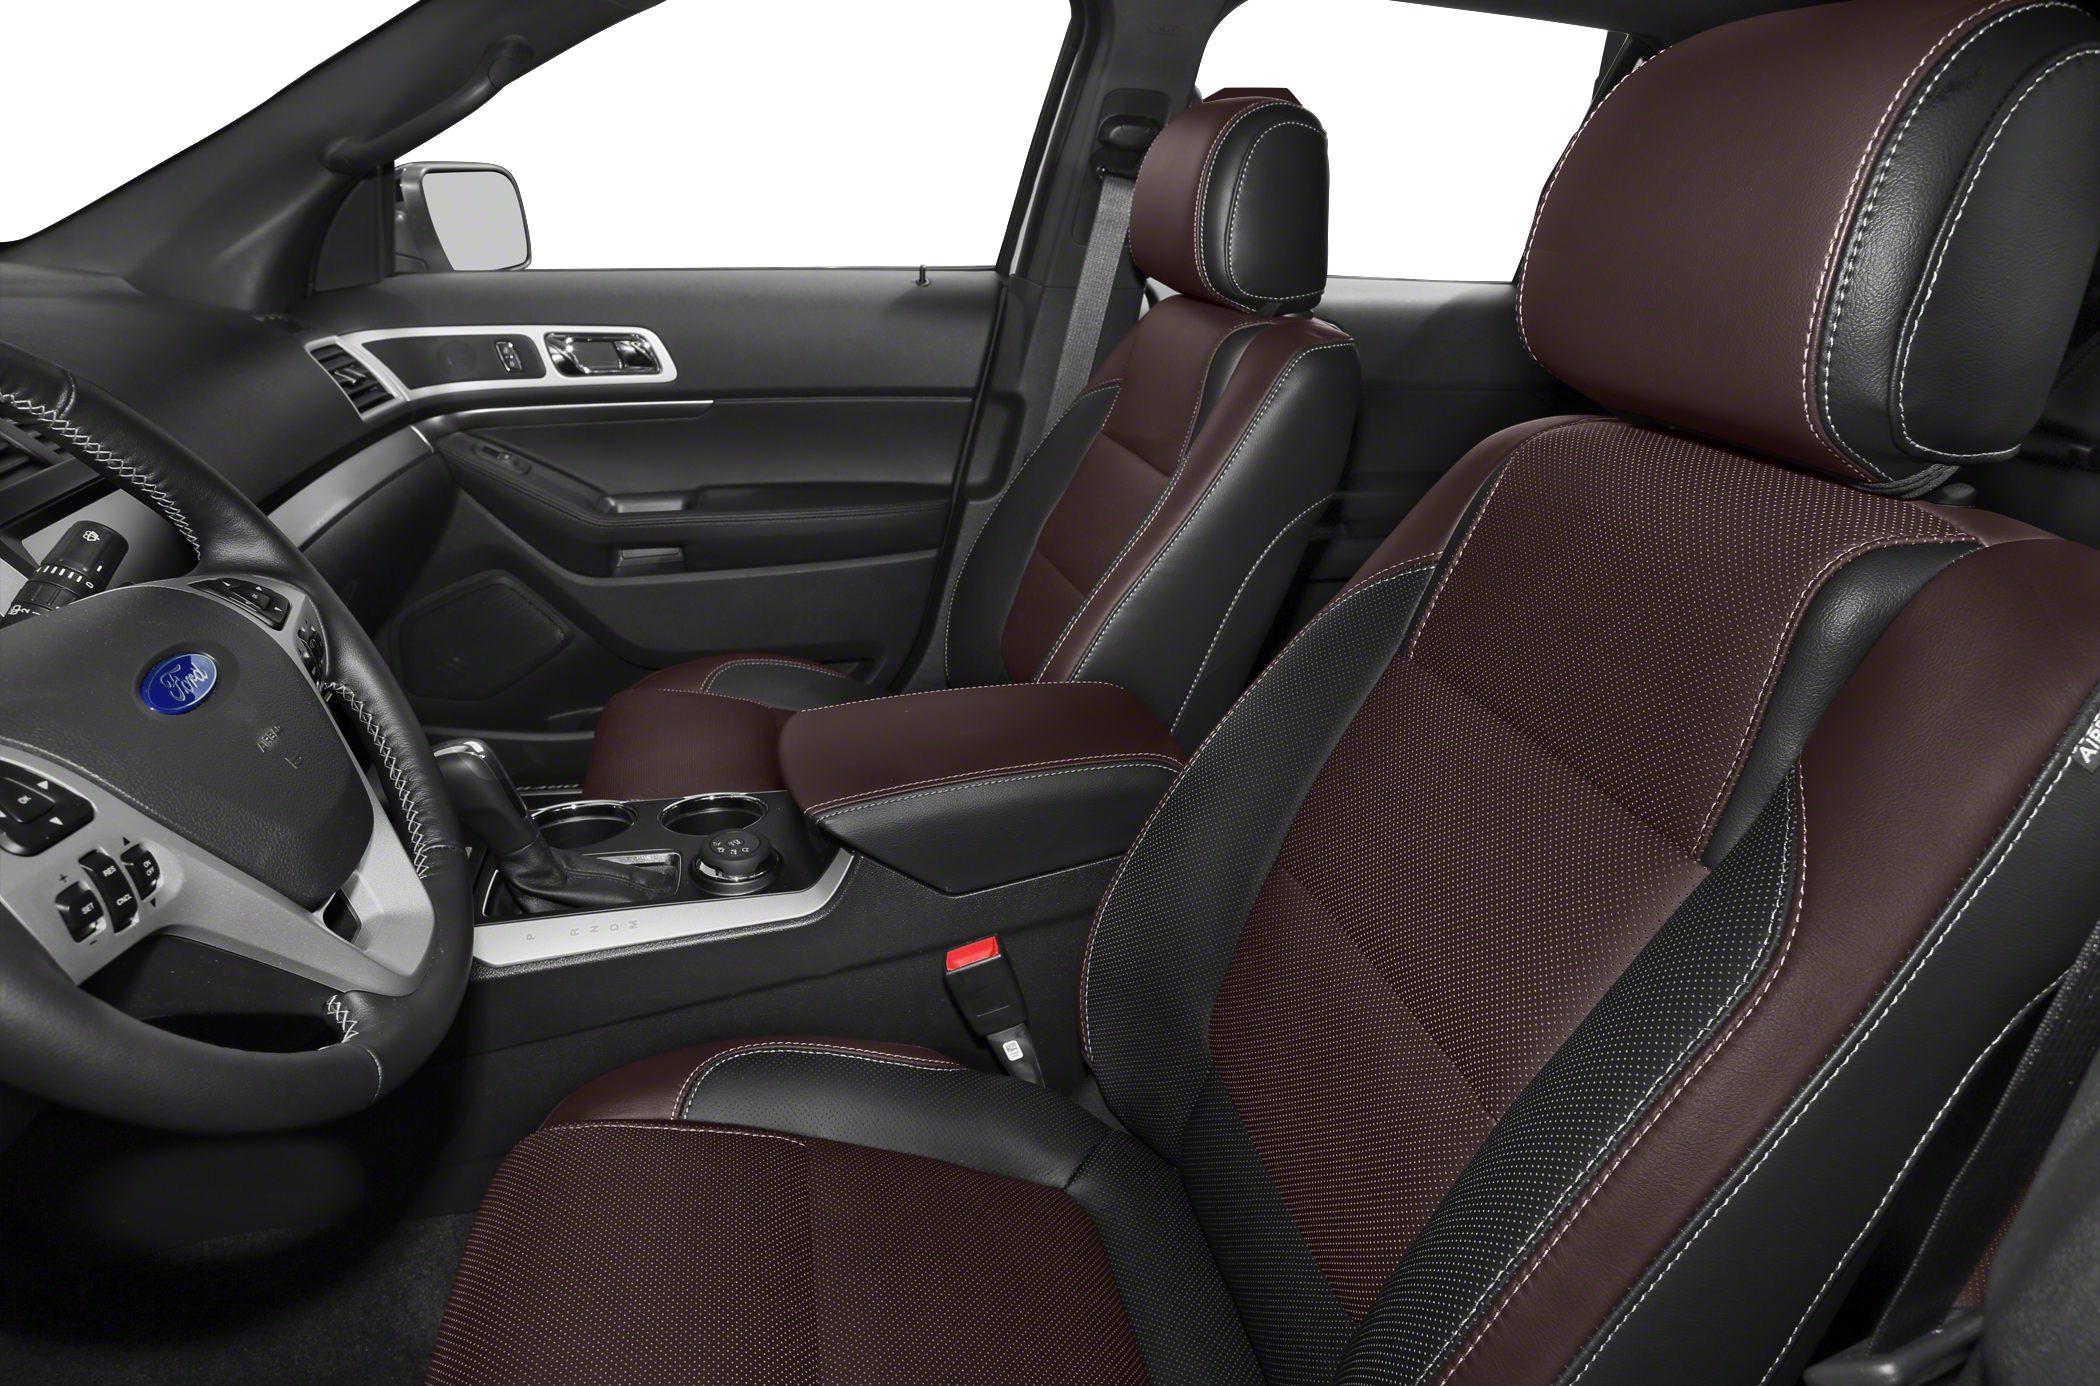 2015 Ford Explorer For Sale >> 2014 Ford Explorer Reviews, Specs and Prices | Cars.com